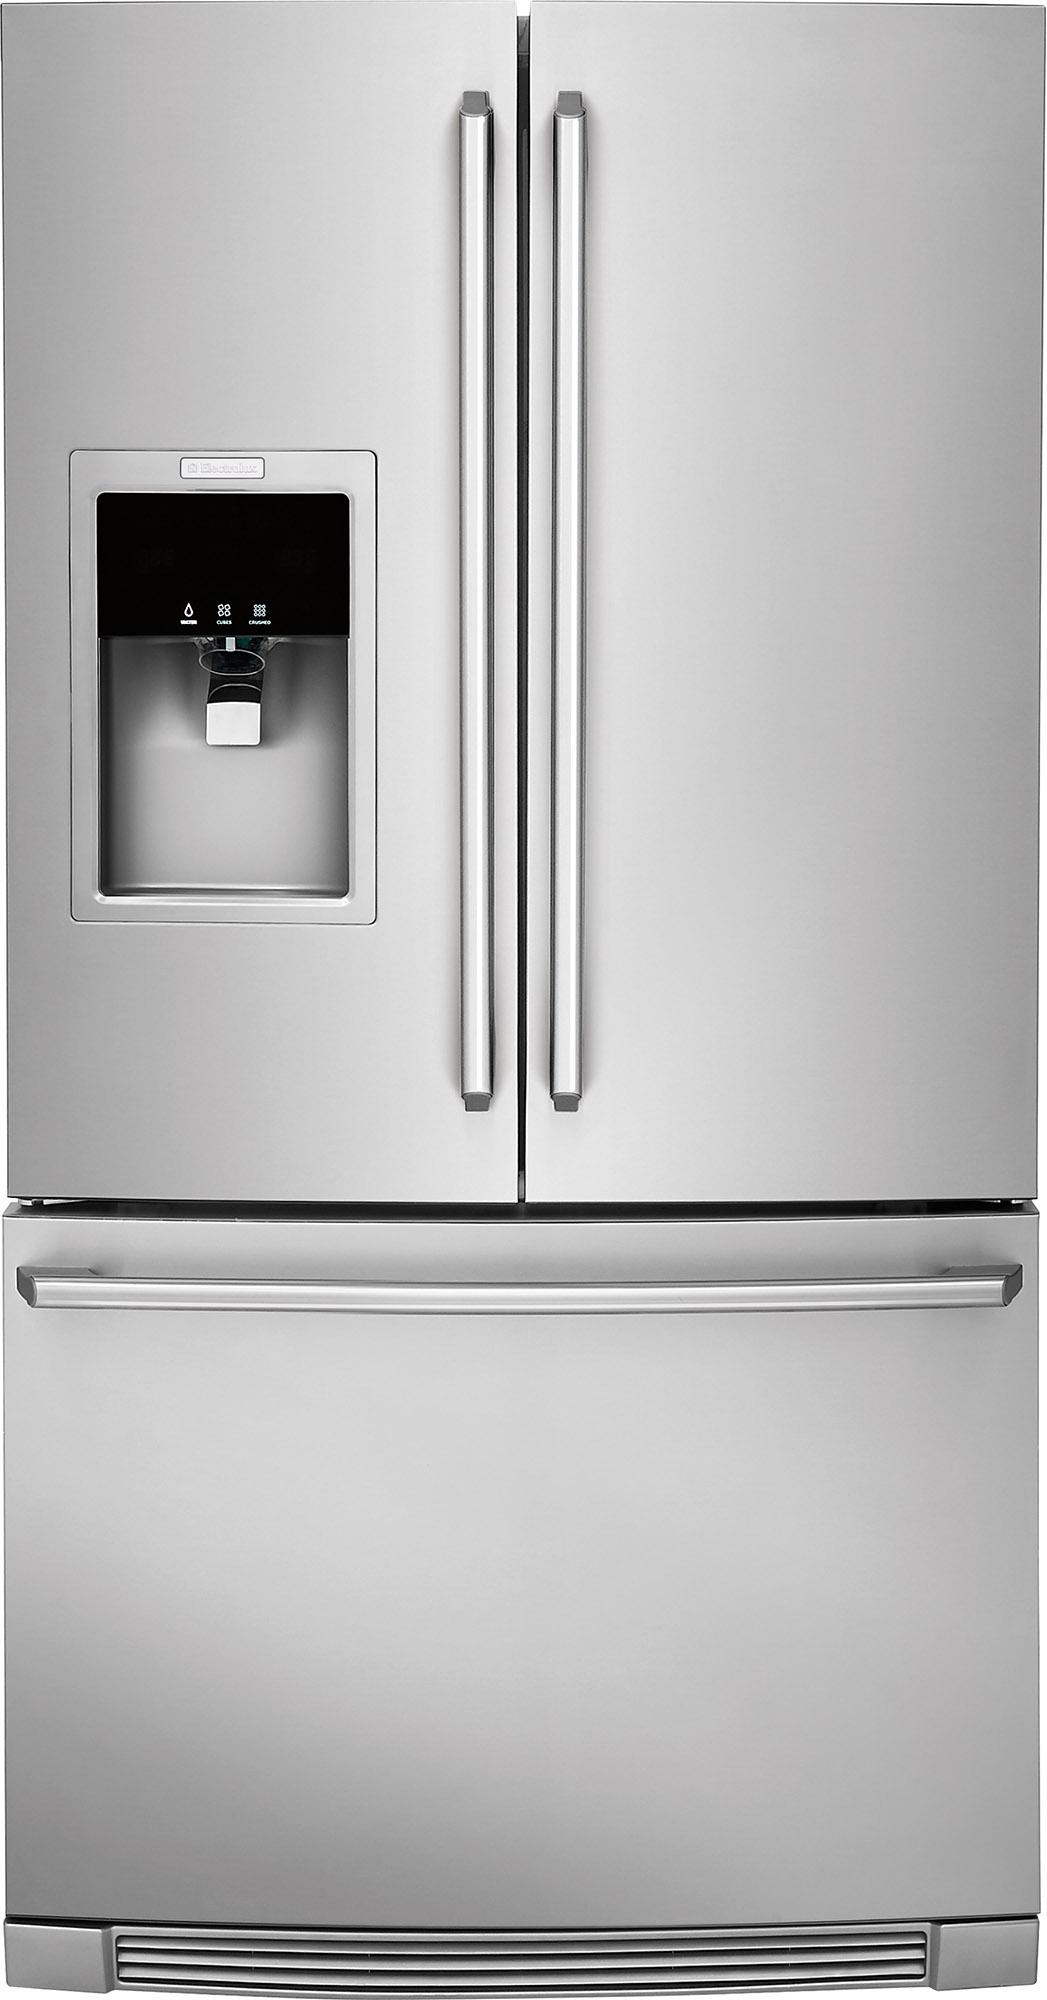 Electrolux 267 Cu Ft Standard Depth French Door Refrigerator Fridge Alarm Circuit Diagram Stainless Steel